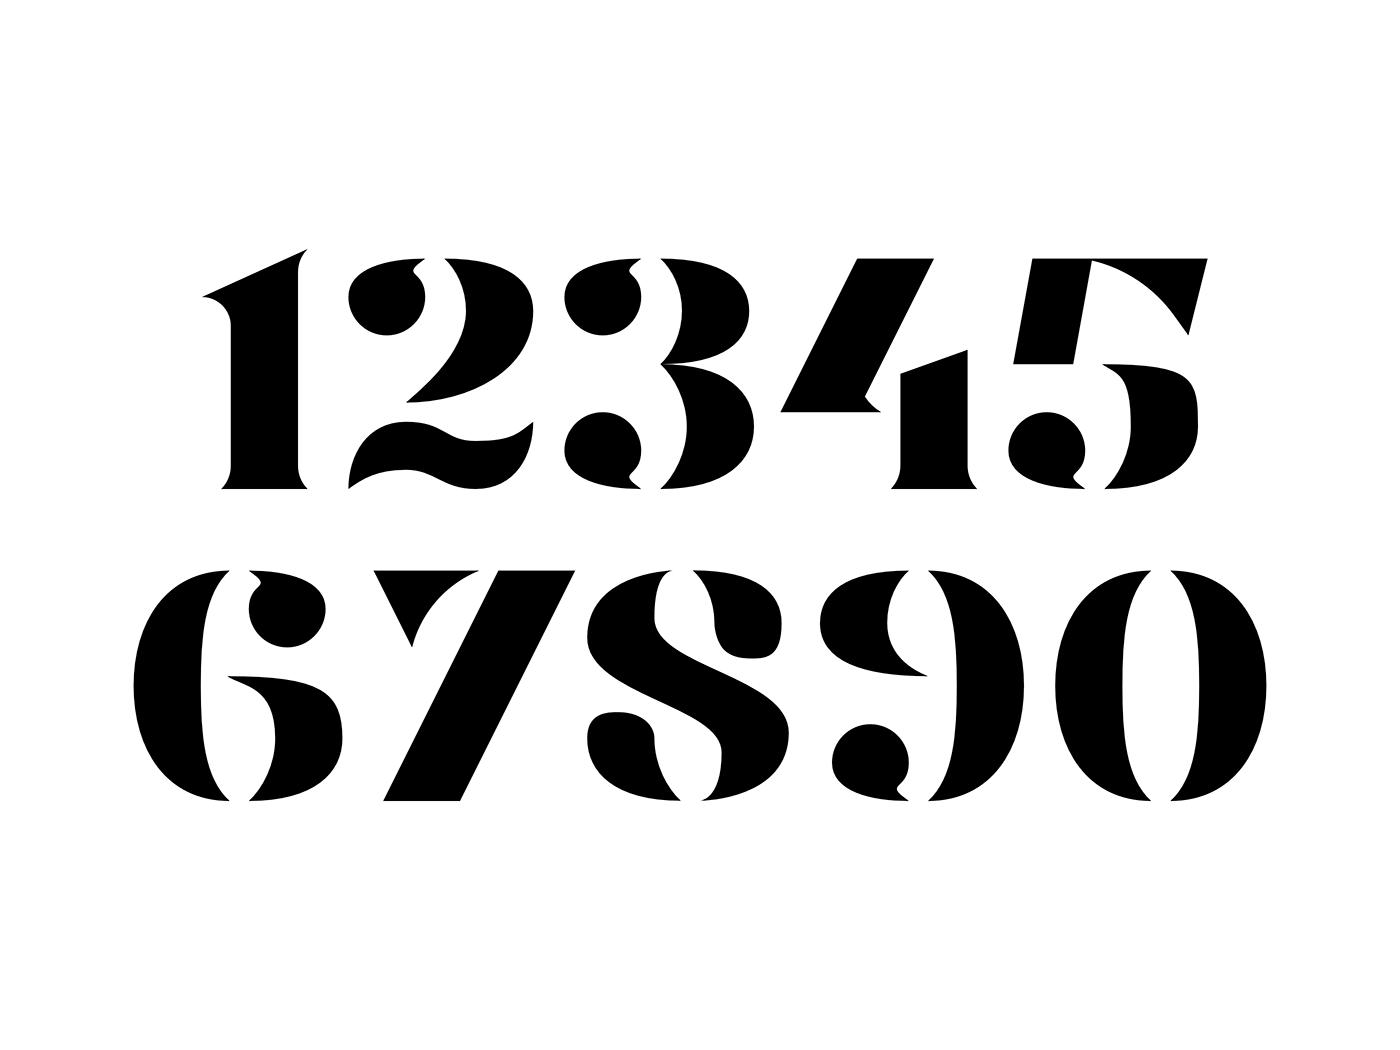 free type font download Title heading editorial magazine poster modern stencil elegant luxury Unique